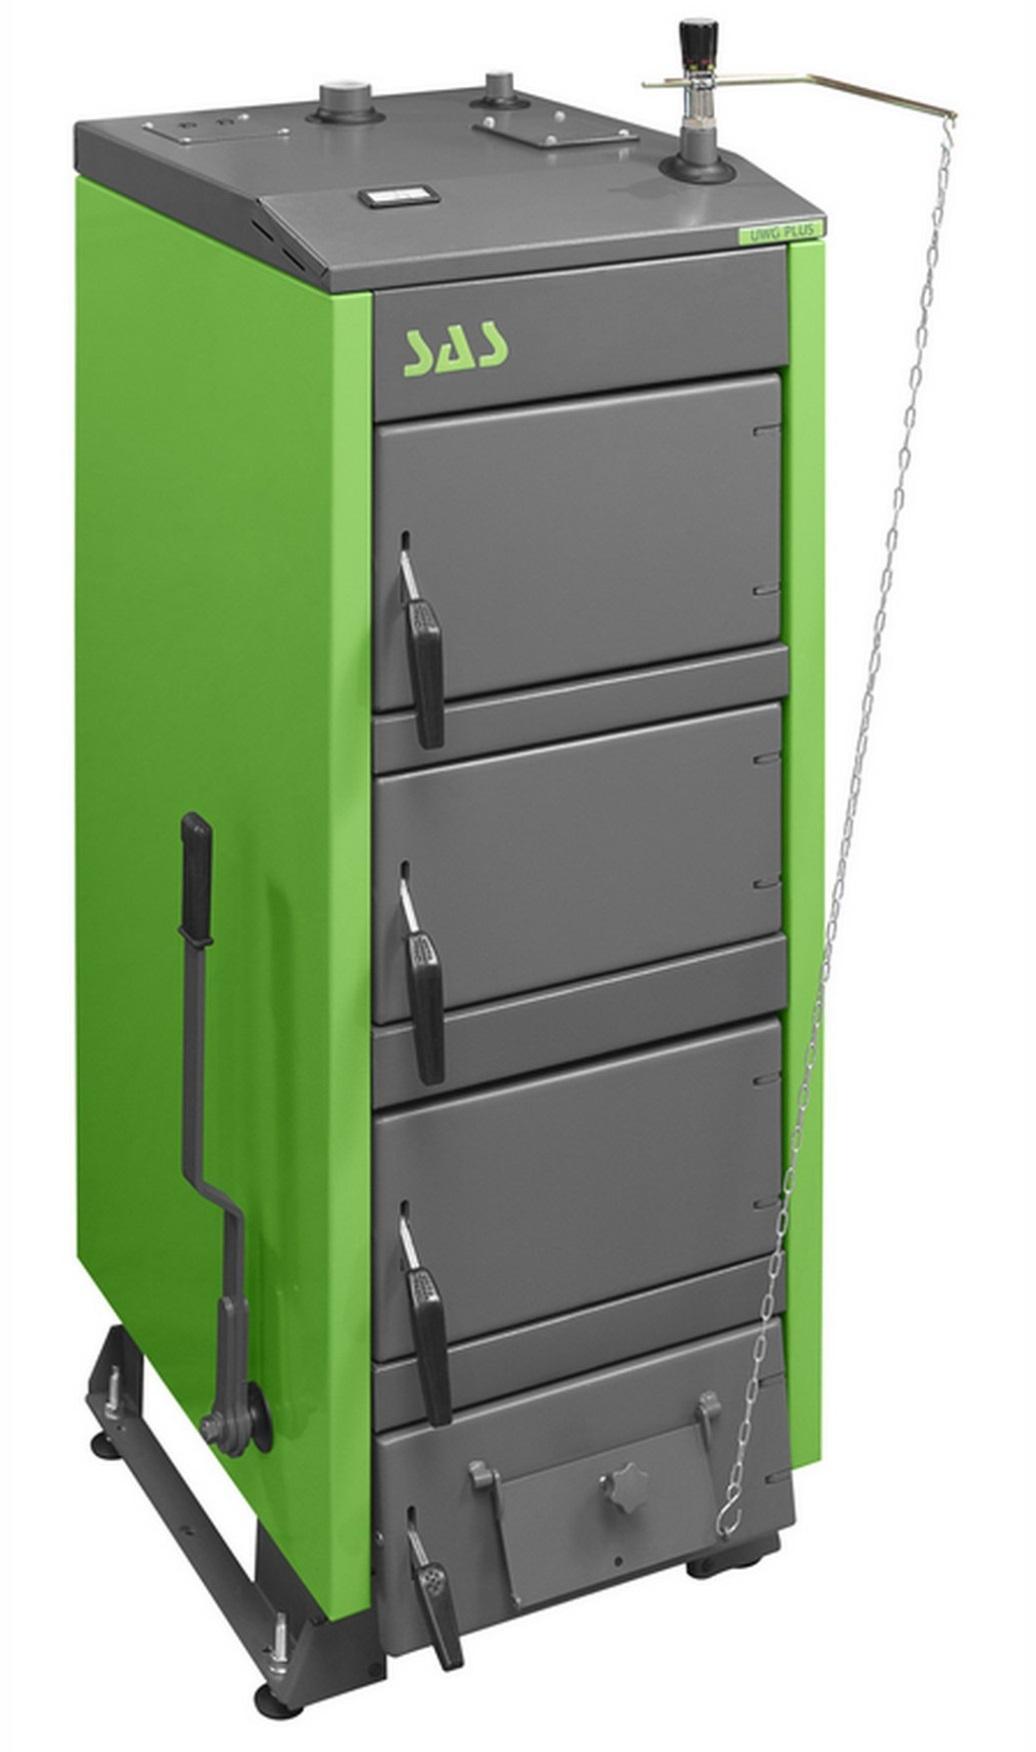 Твердотопливный котёл SAS UWG PLUS 29 kWt